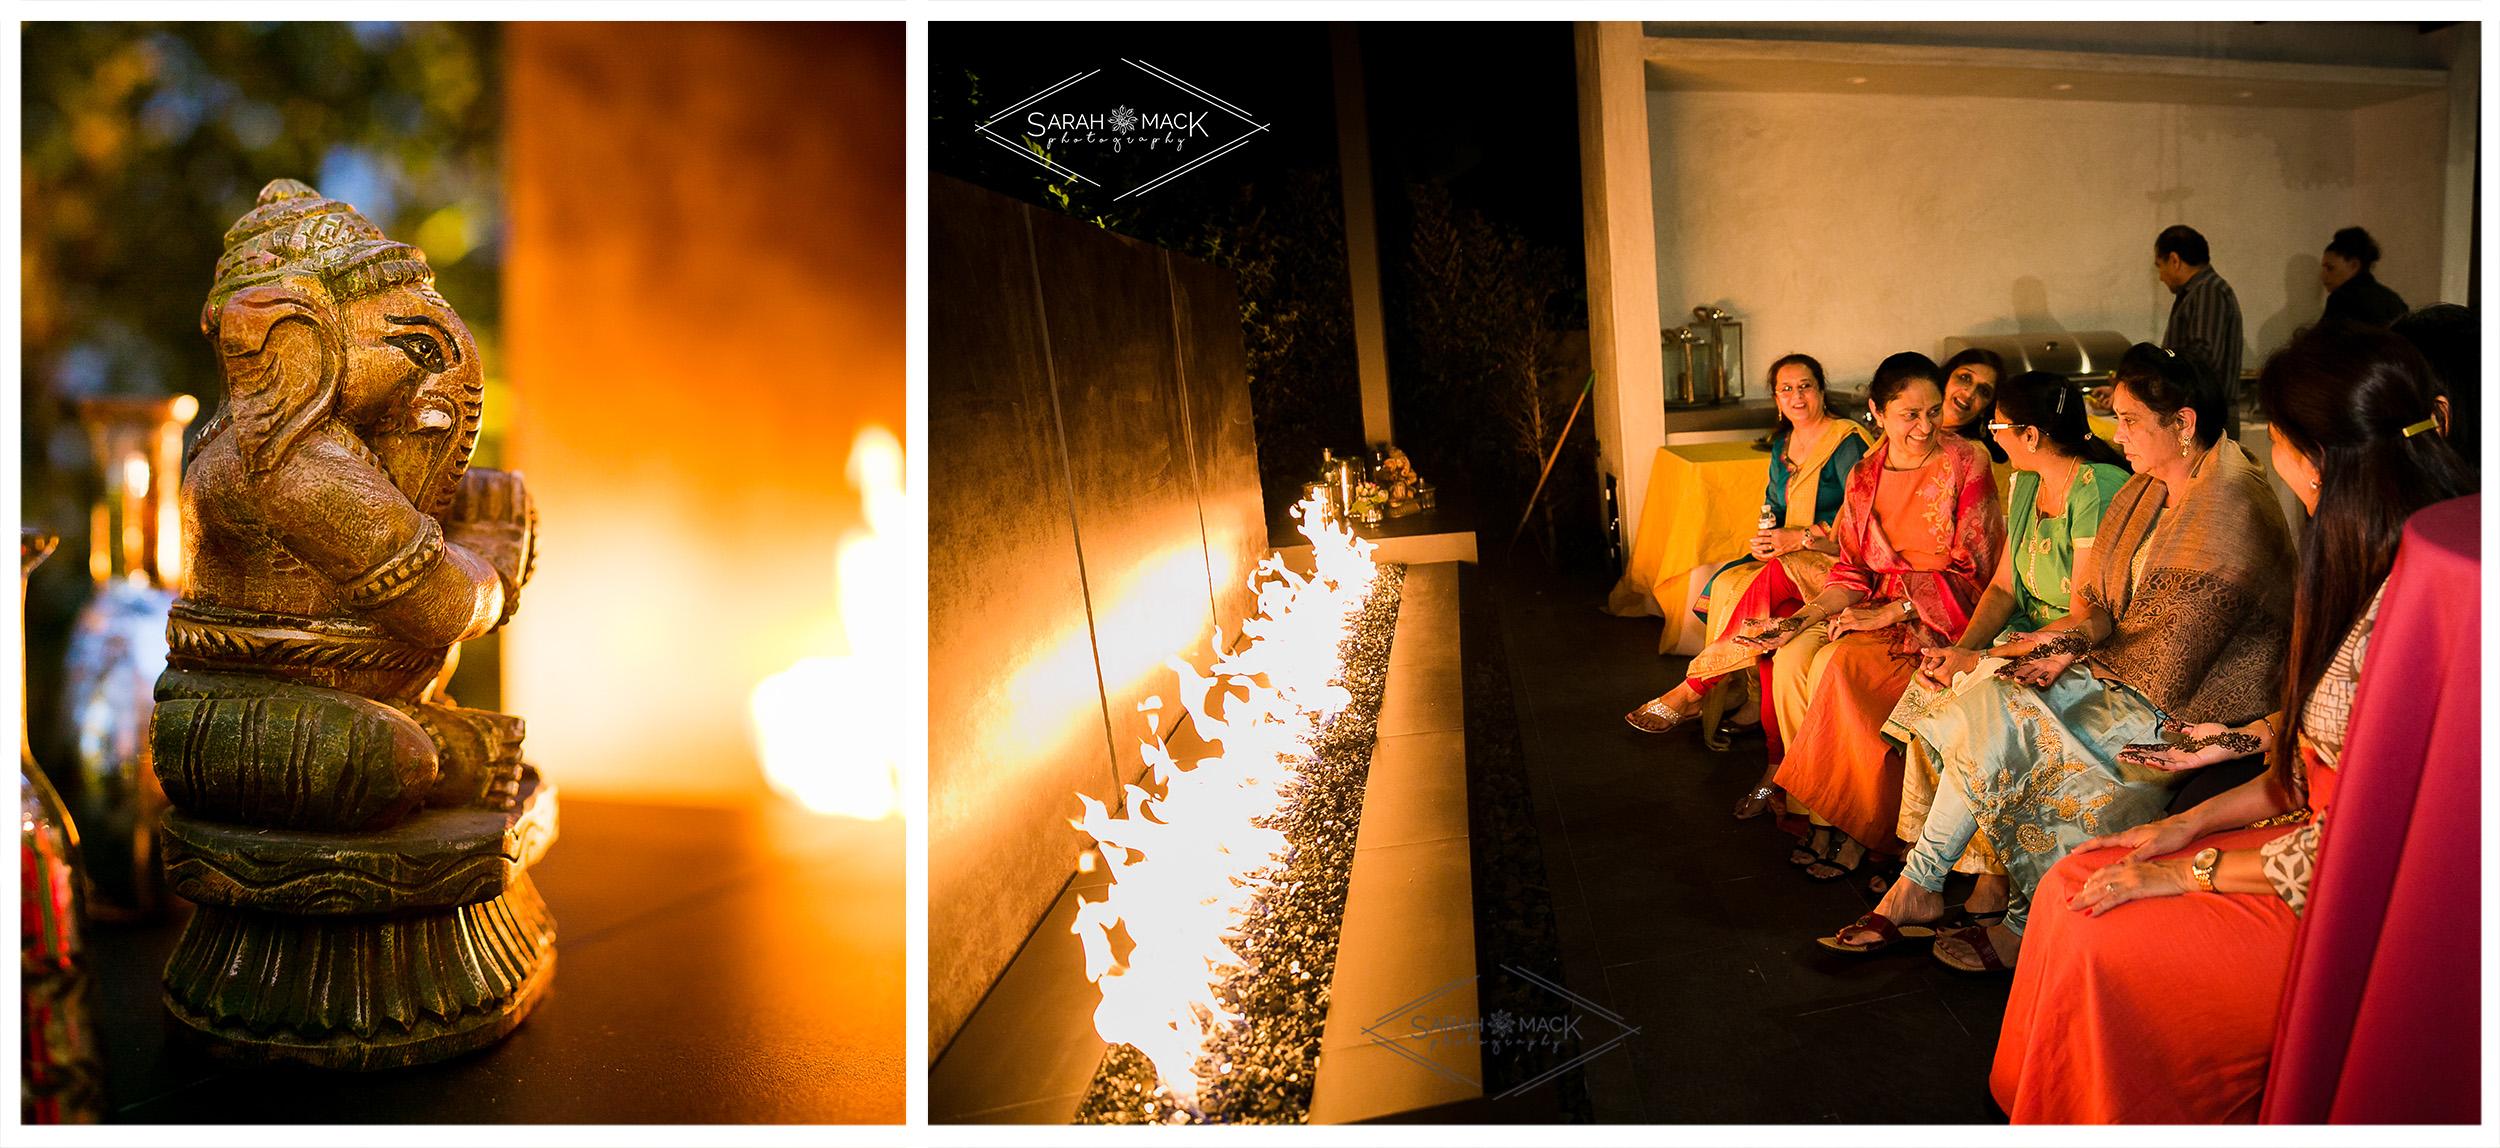 PR-Irvine-Mendhi-Indian-Wedding-Photography-17.jpg